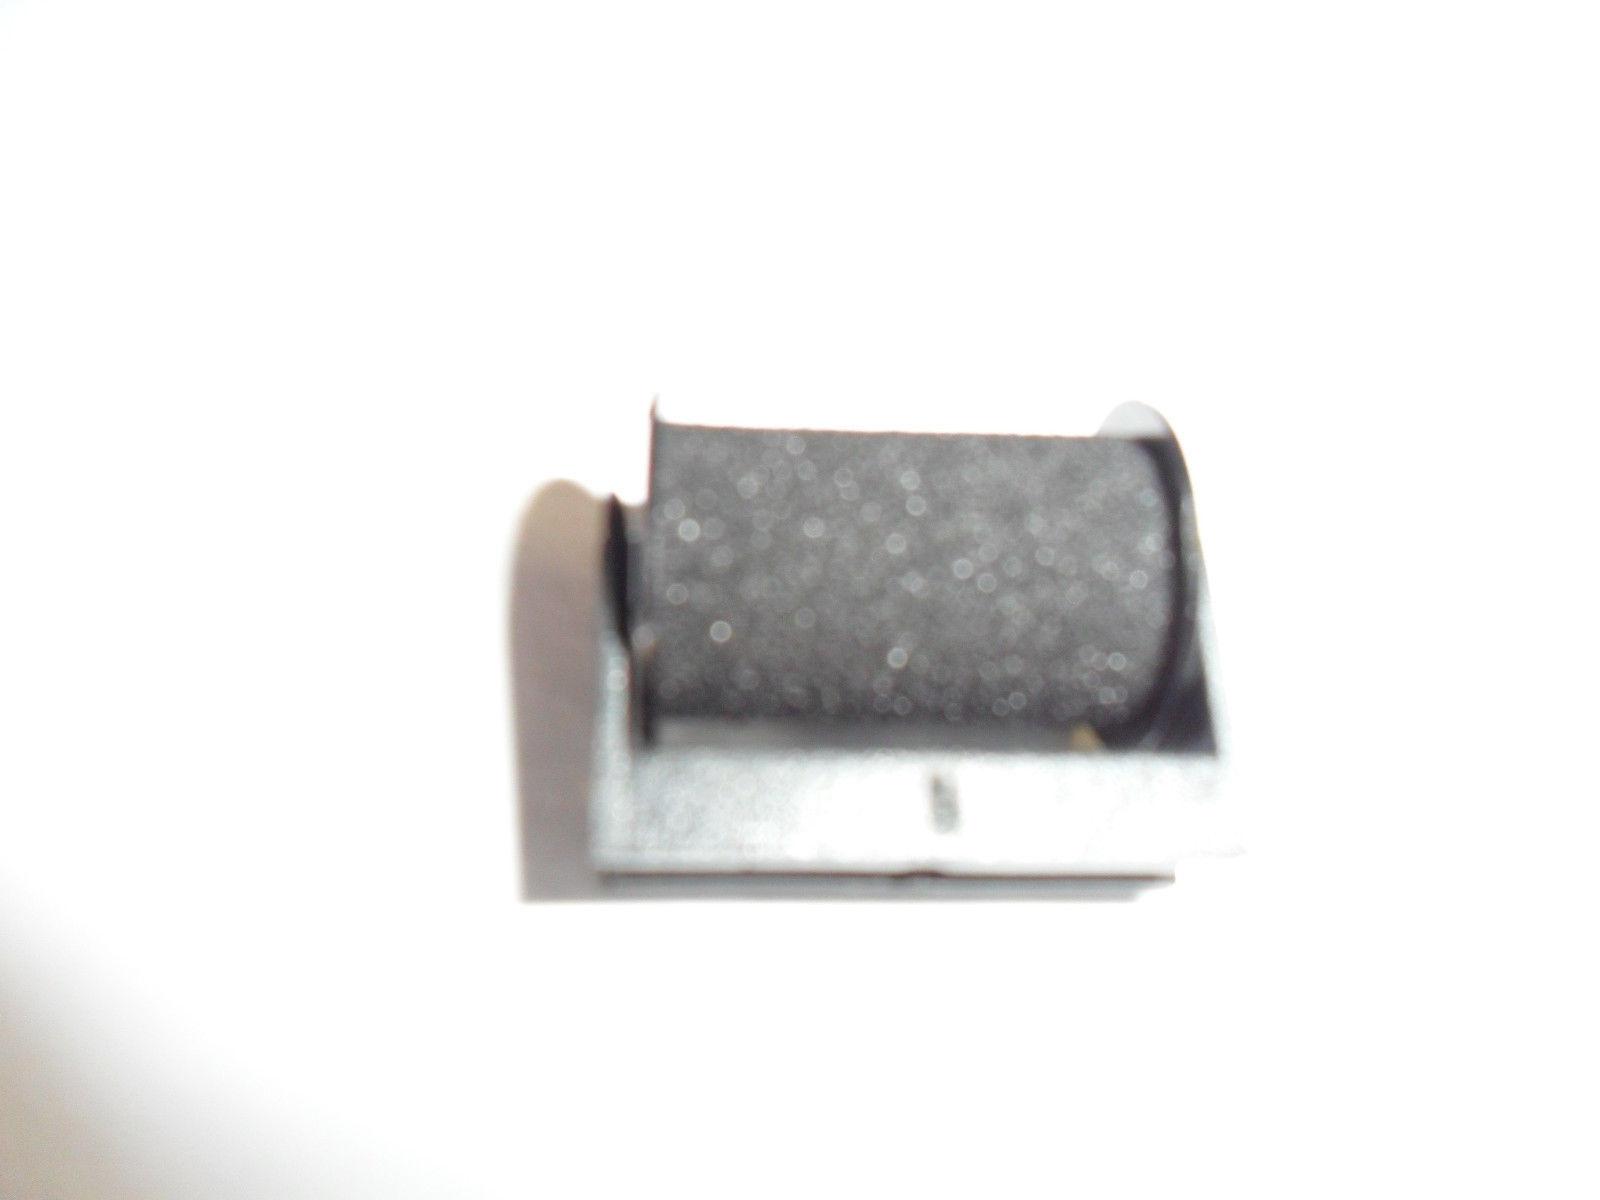 Dennison Sato PB-216/216/PB-210/210 Pricing Gun Ink Roller (2 Pack)